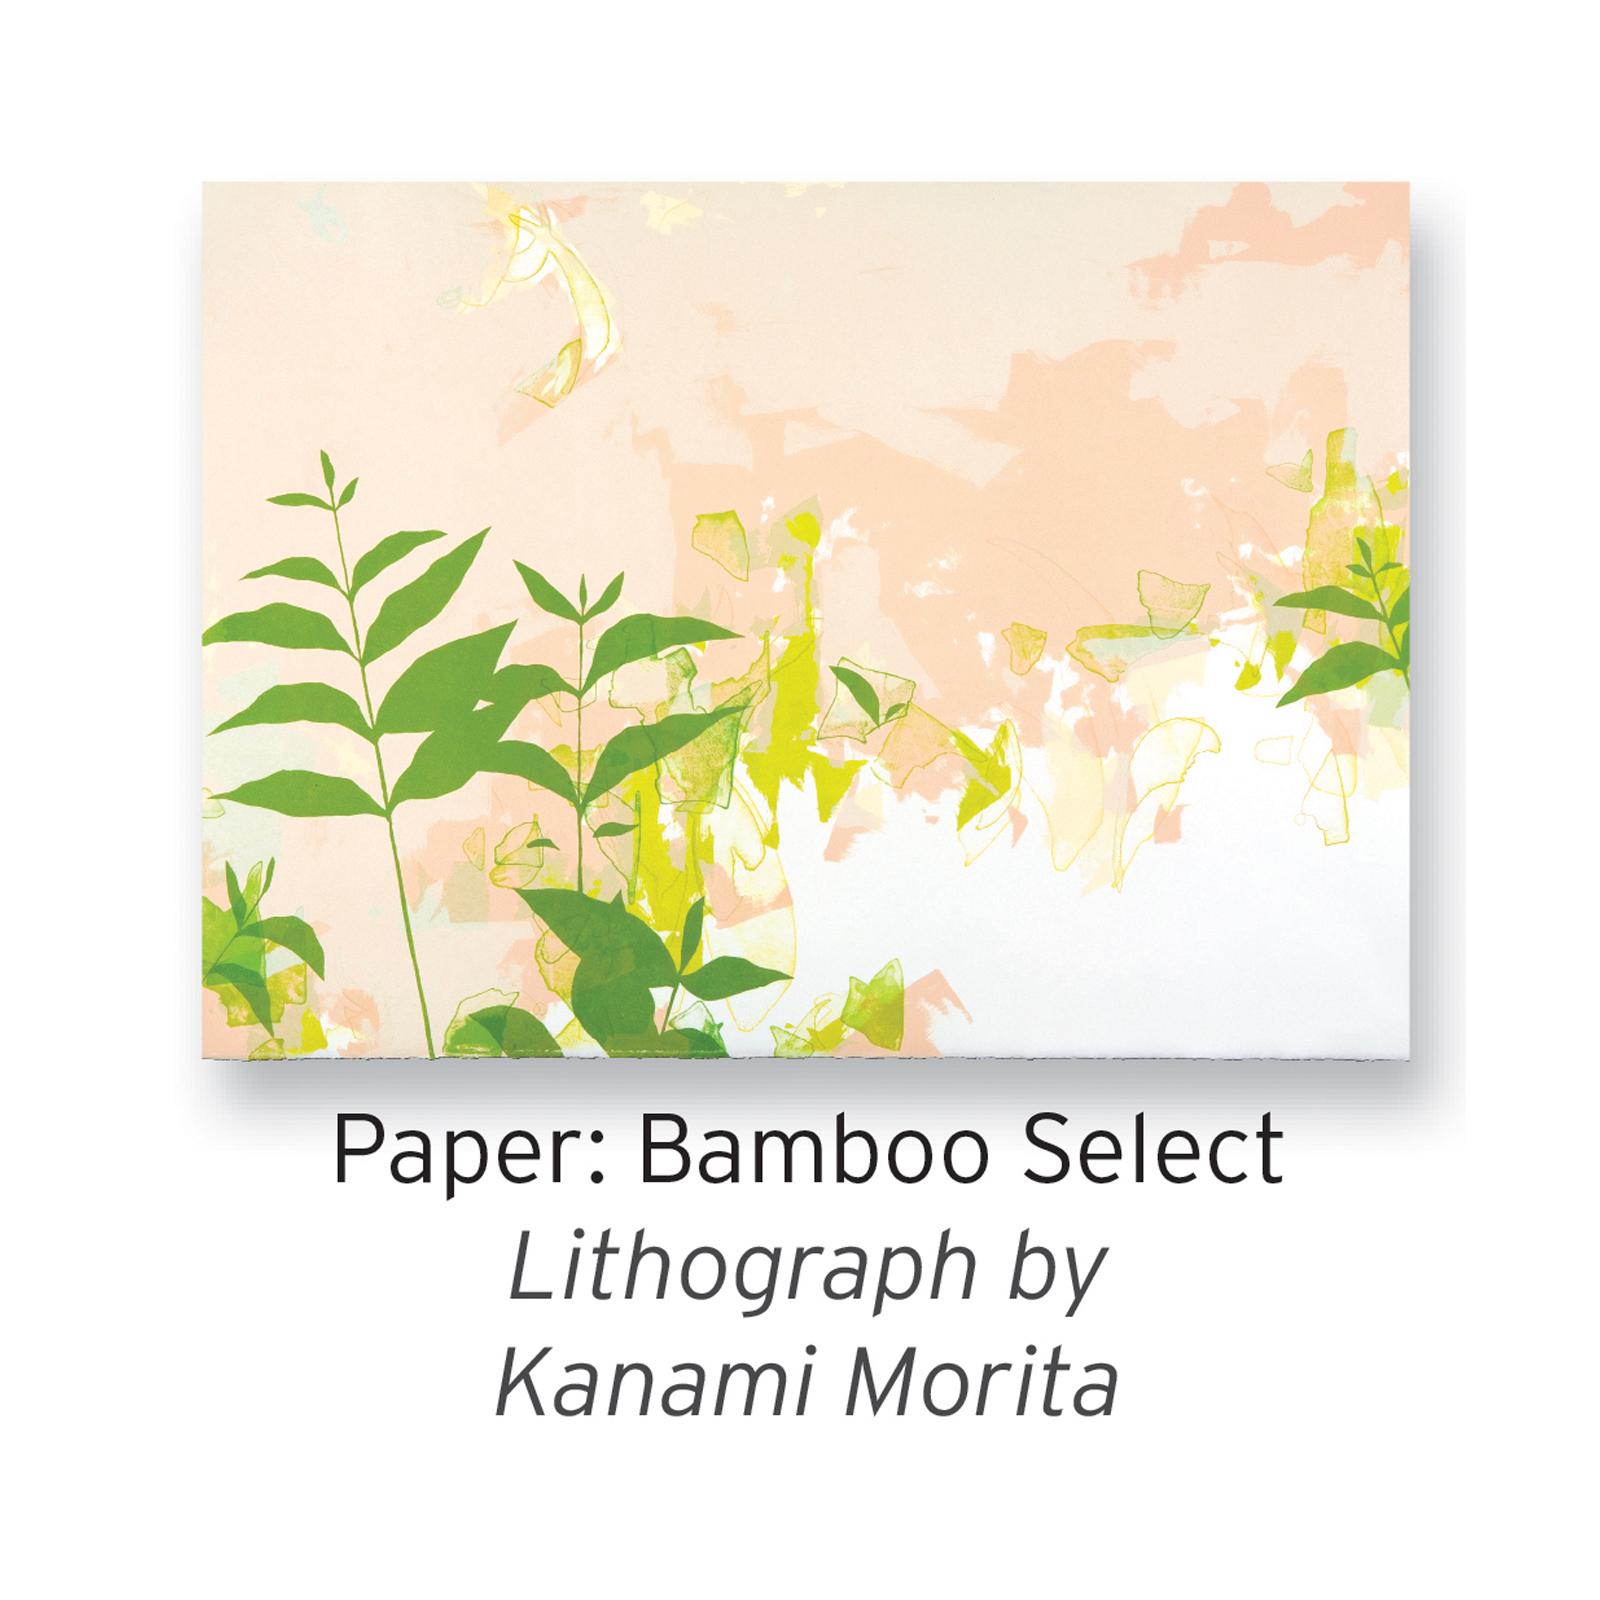 Bamboo Select